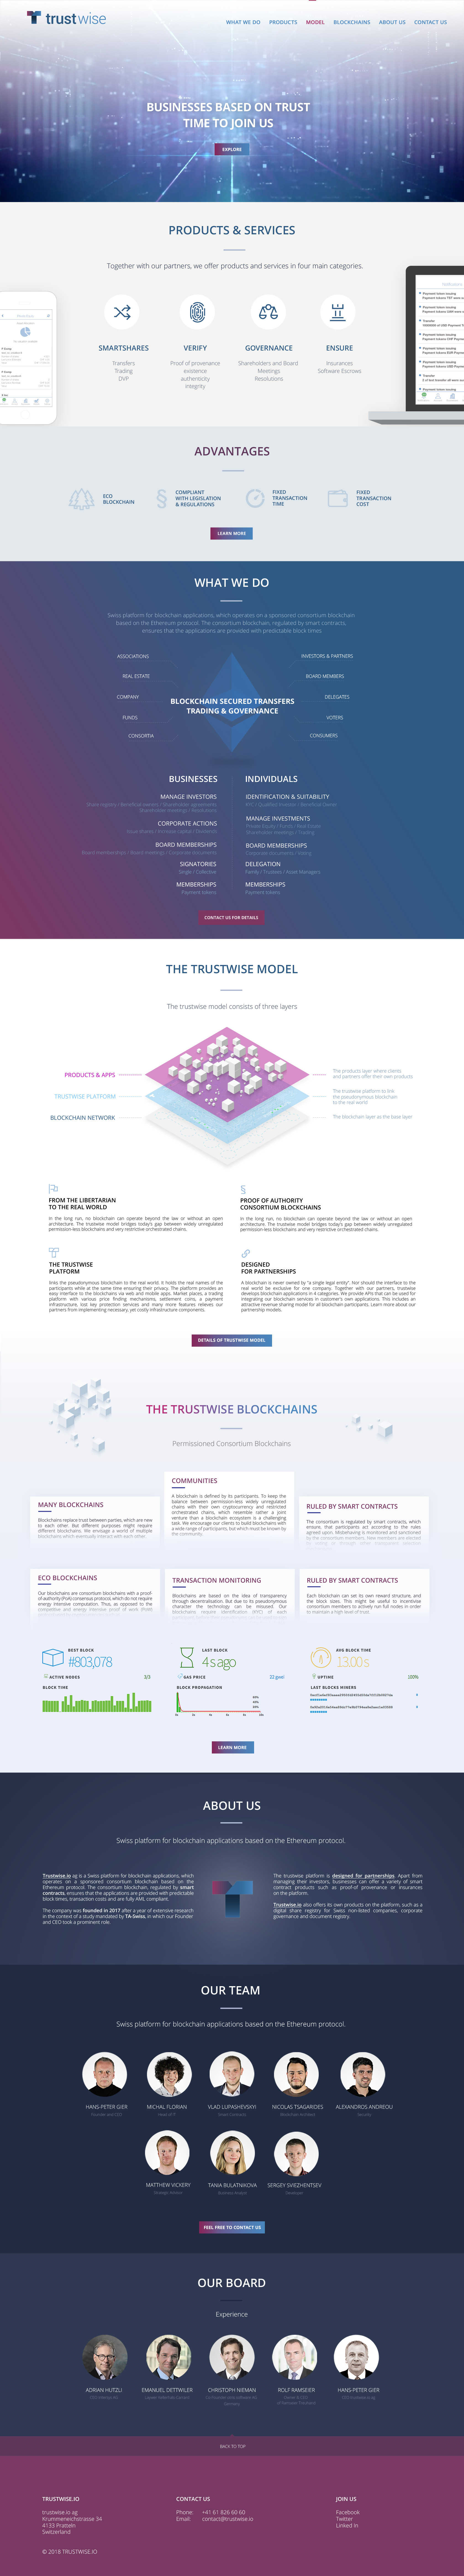 Trustwise.io ag - realizace, Webdesign